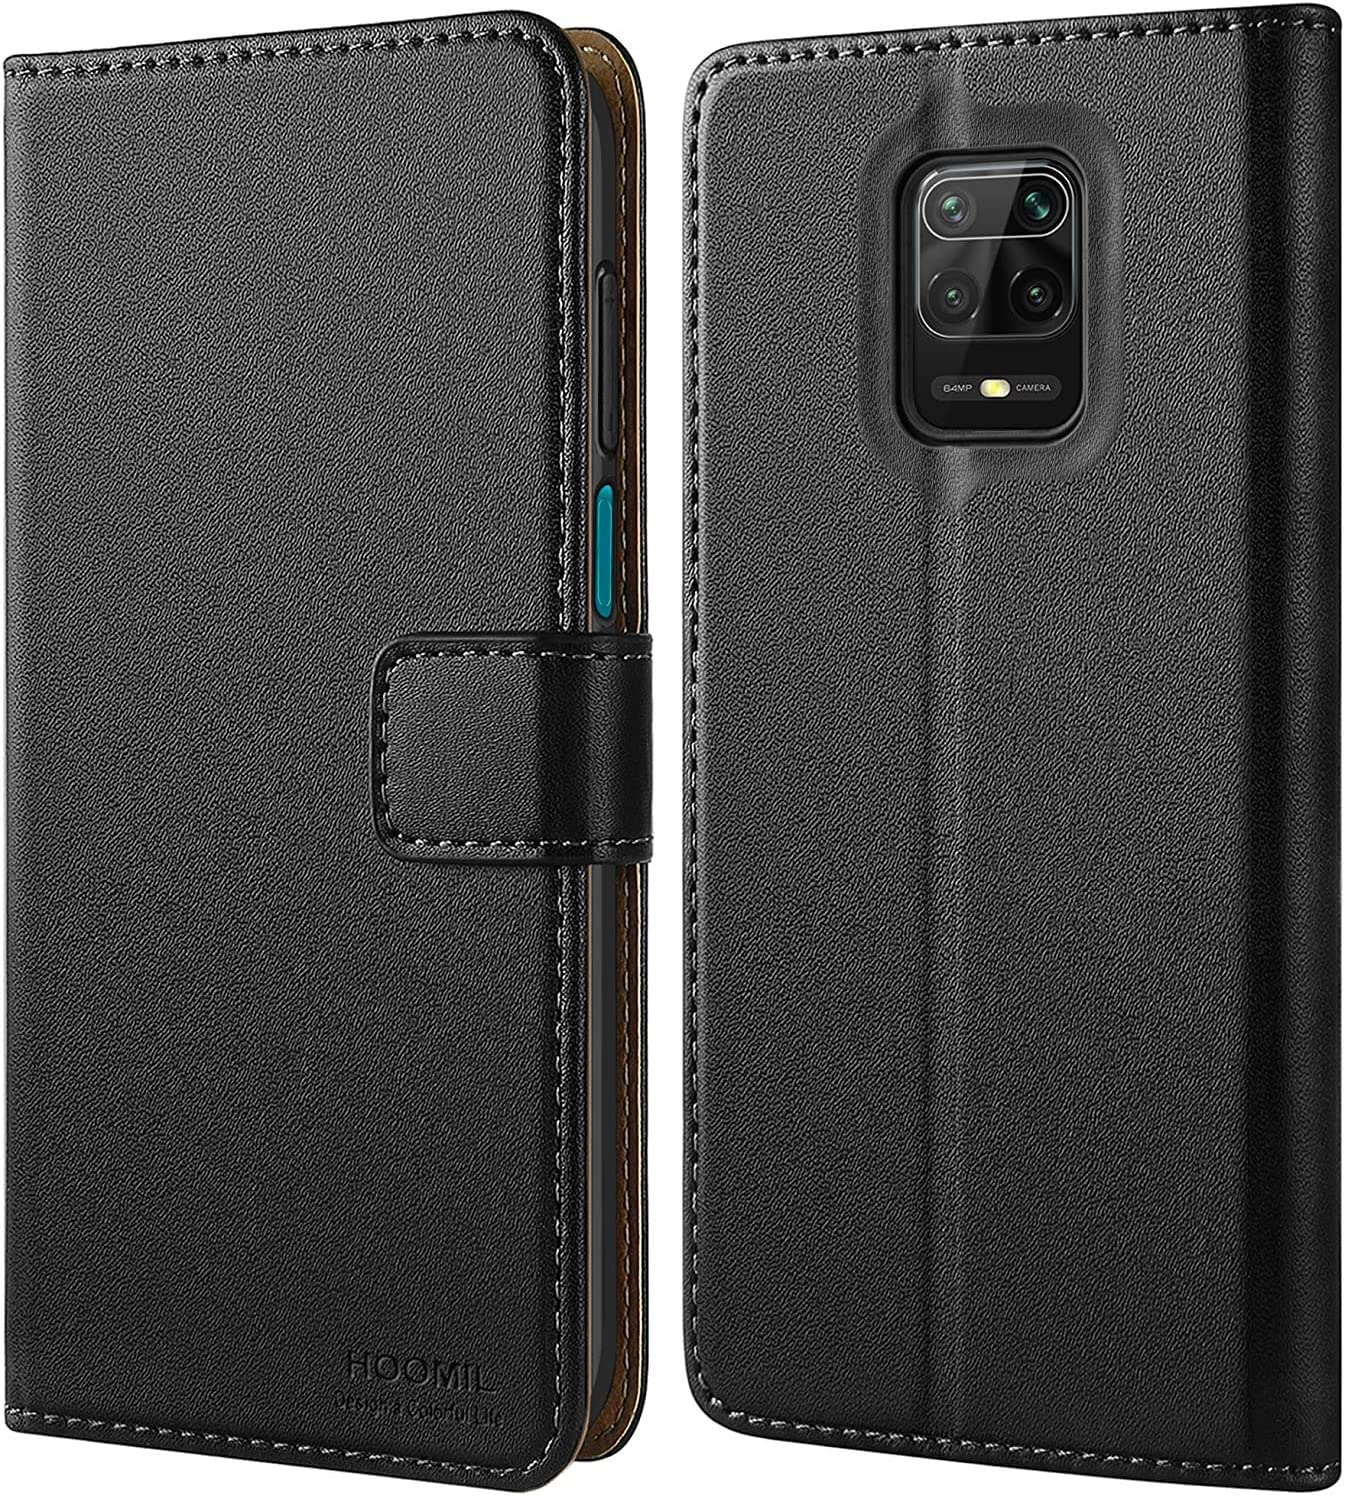 HOOMIL Funda para Xiaomi Redmi Note 9S, Funda para Xiaomi Redmi Note 9 Pro, Funda de Cuero PU Premium Carcasa para Xiaomi Redmi Note 9S/Redmi Note 9 Pro (Negro)